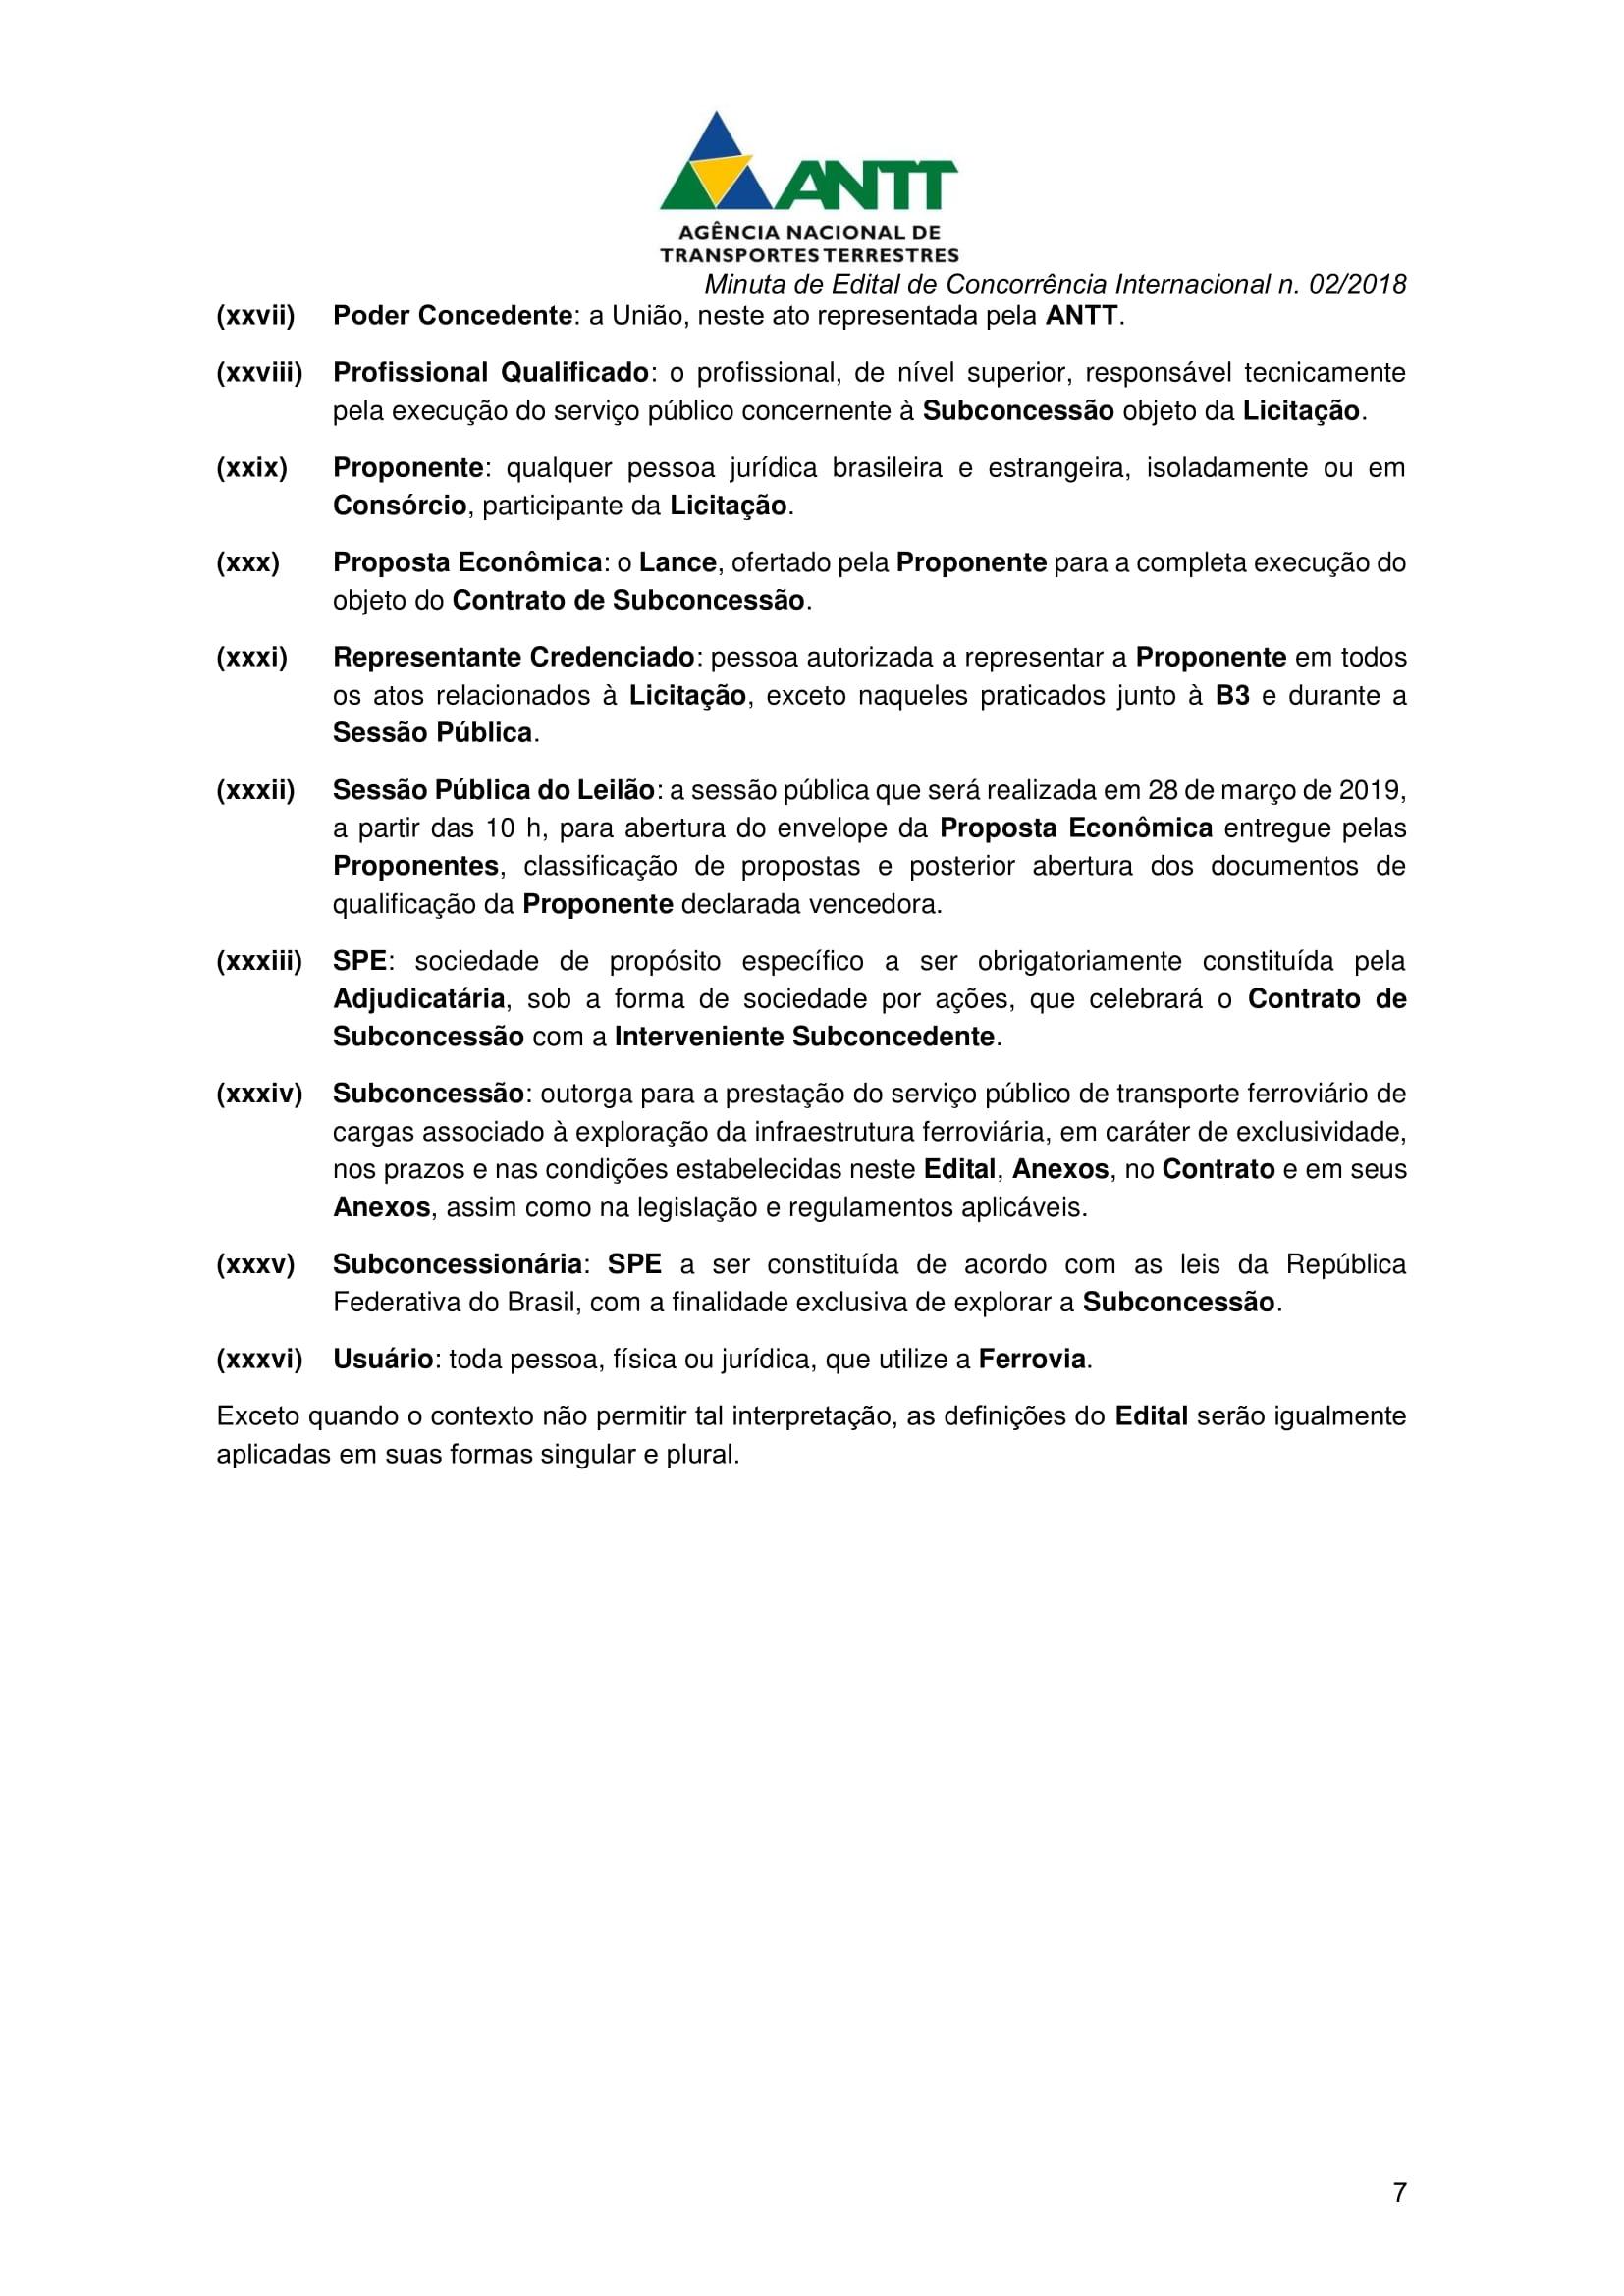 minuta_de_edital_-_porto_nacional-estrela_doeste-07